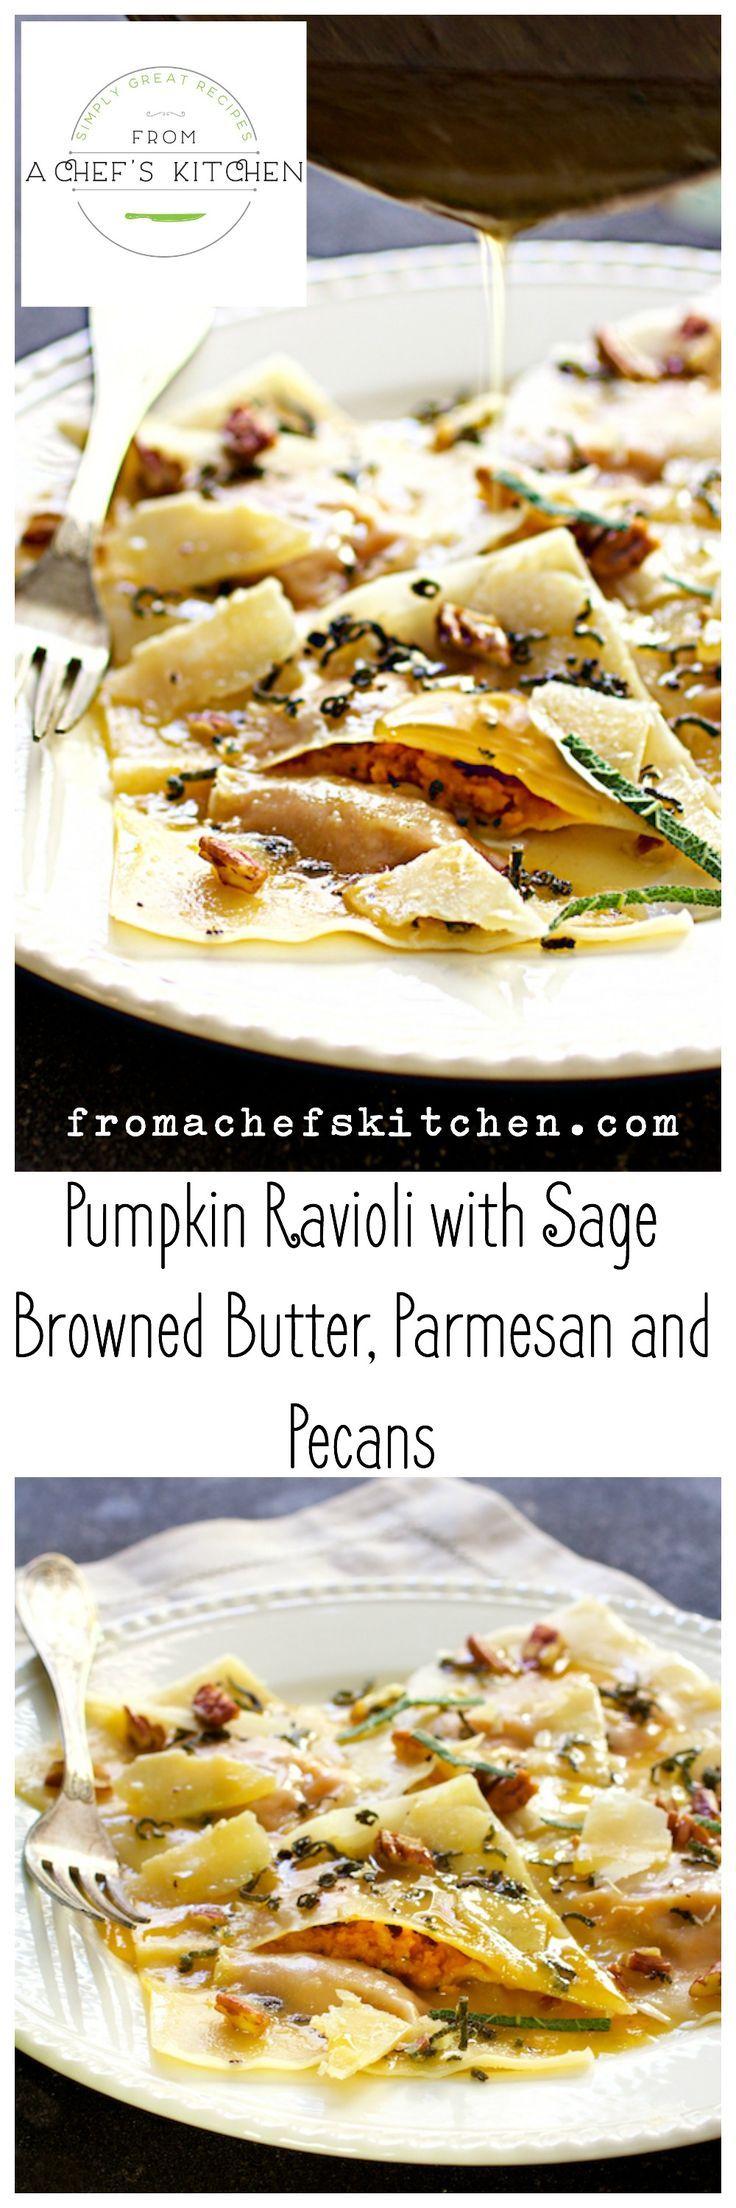 how to make homemade ravioli filling